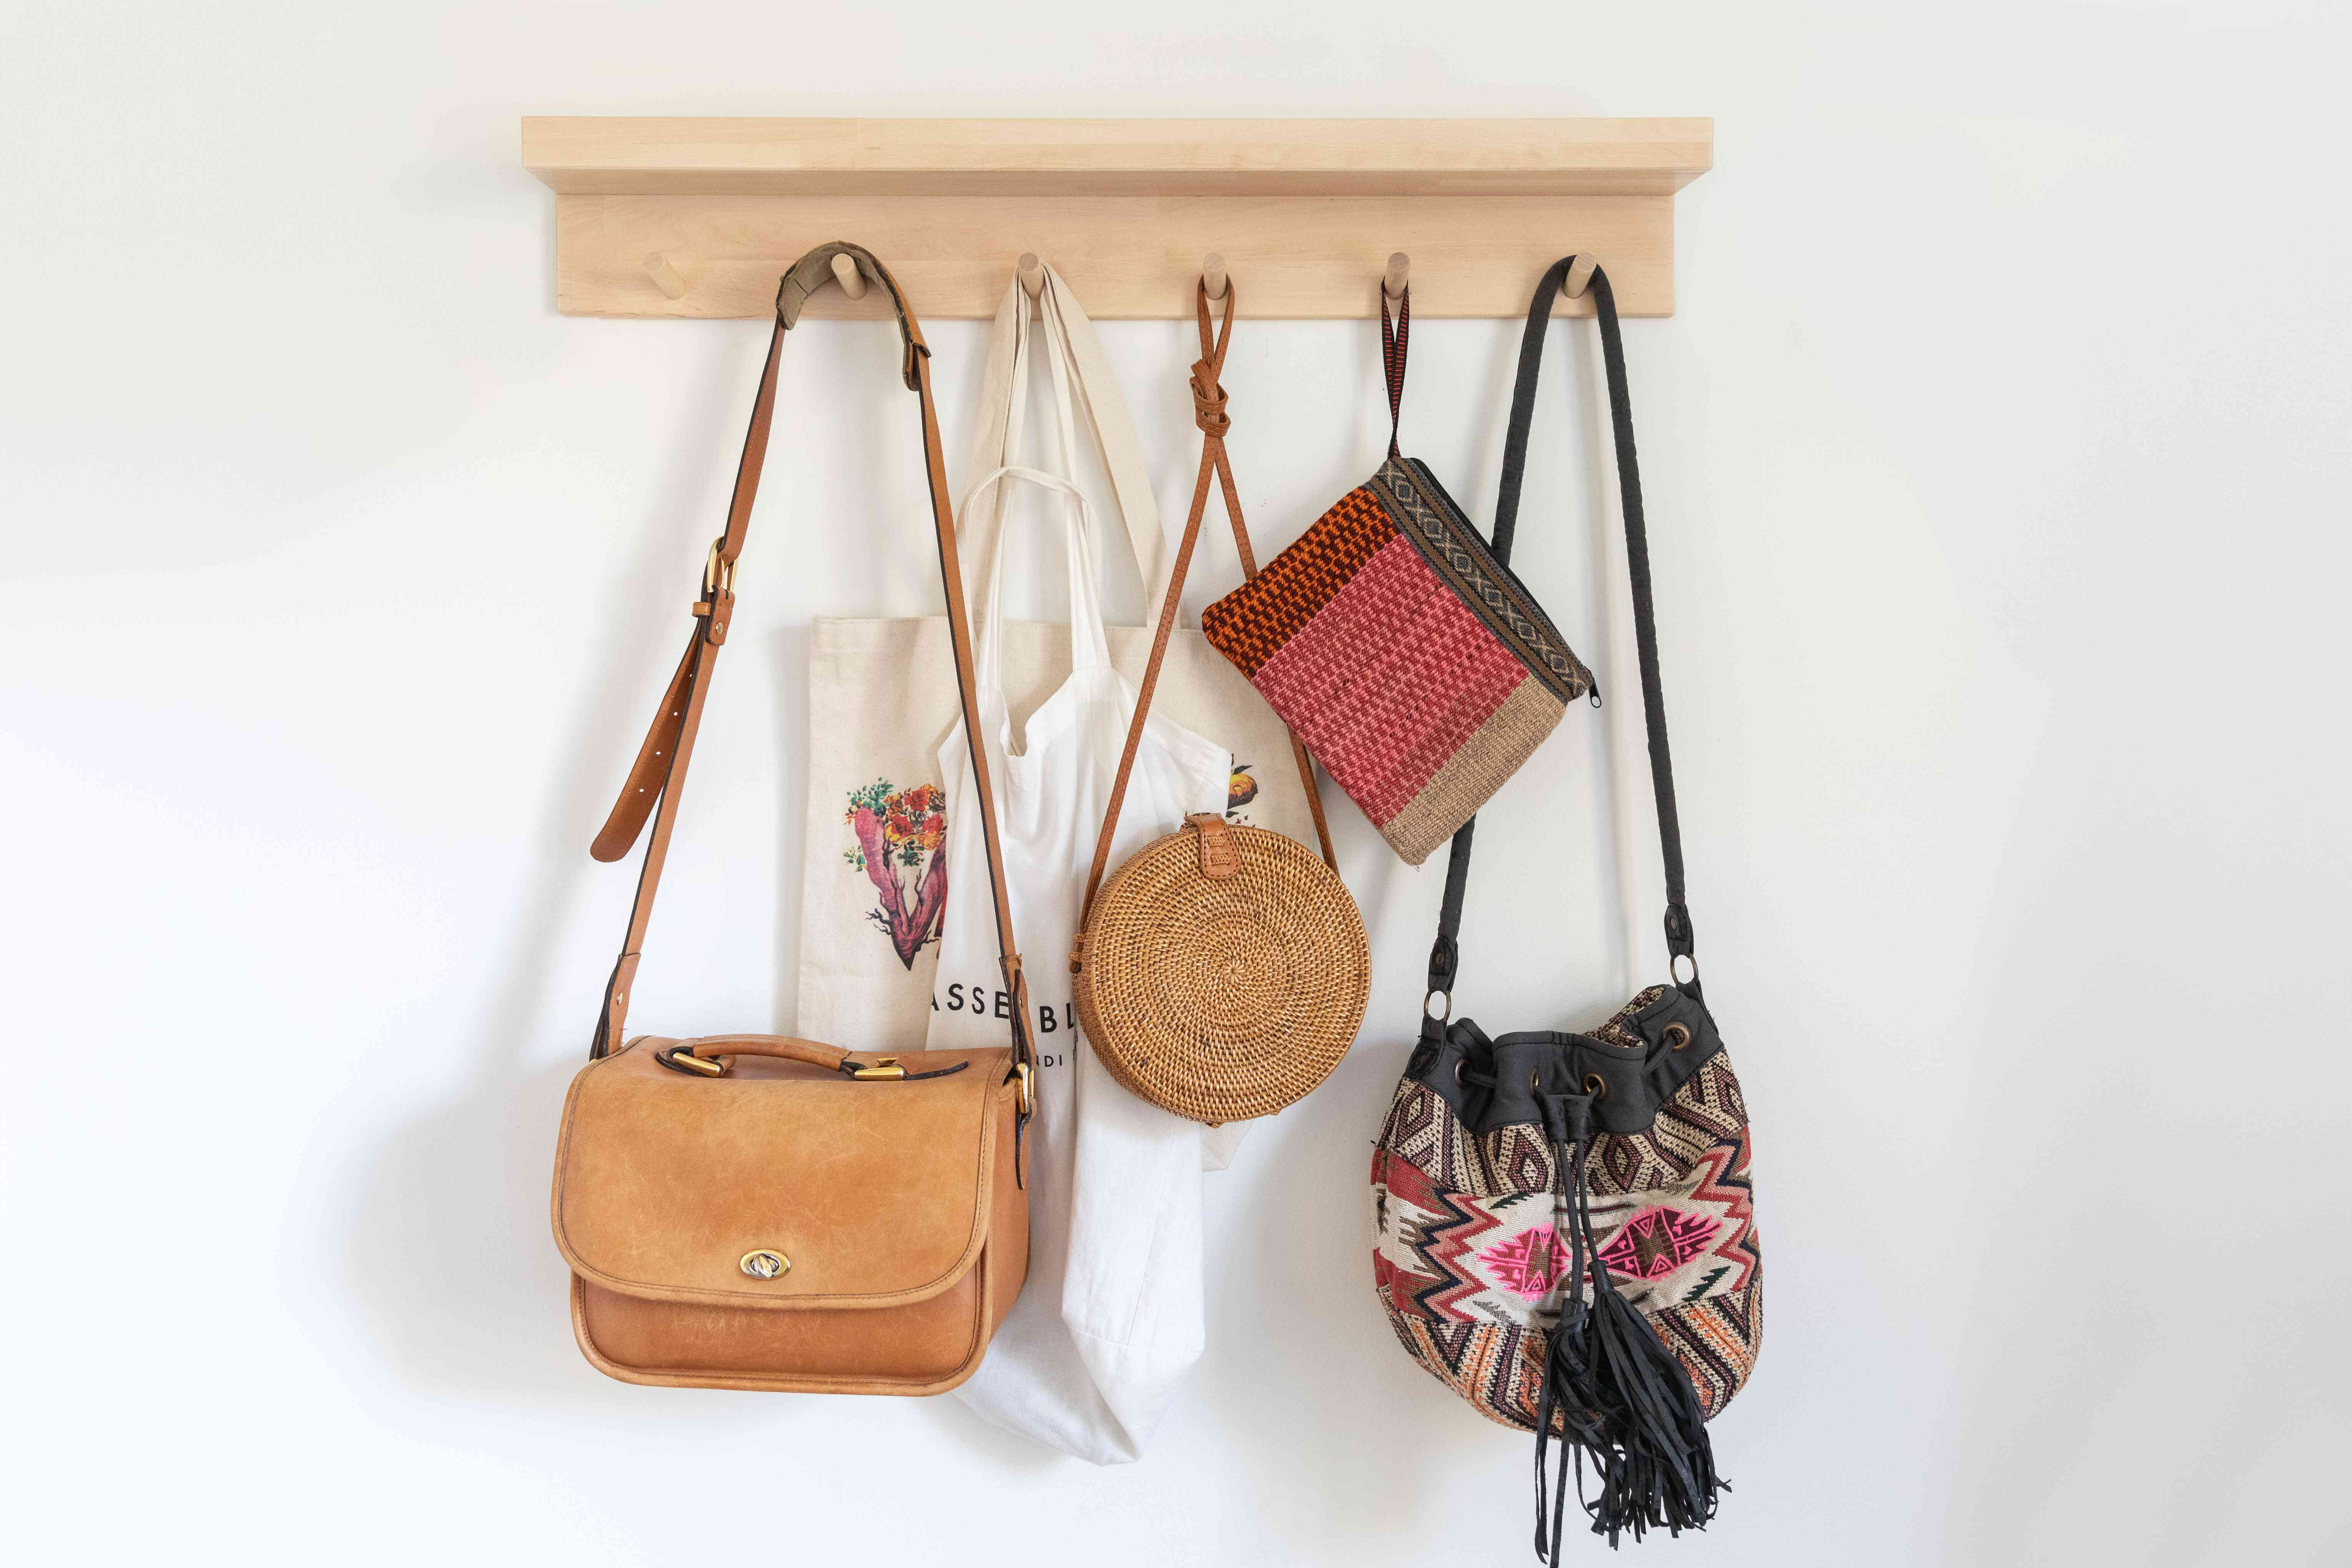 9 Clever Handbag Storage Ideas